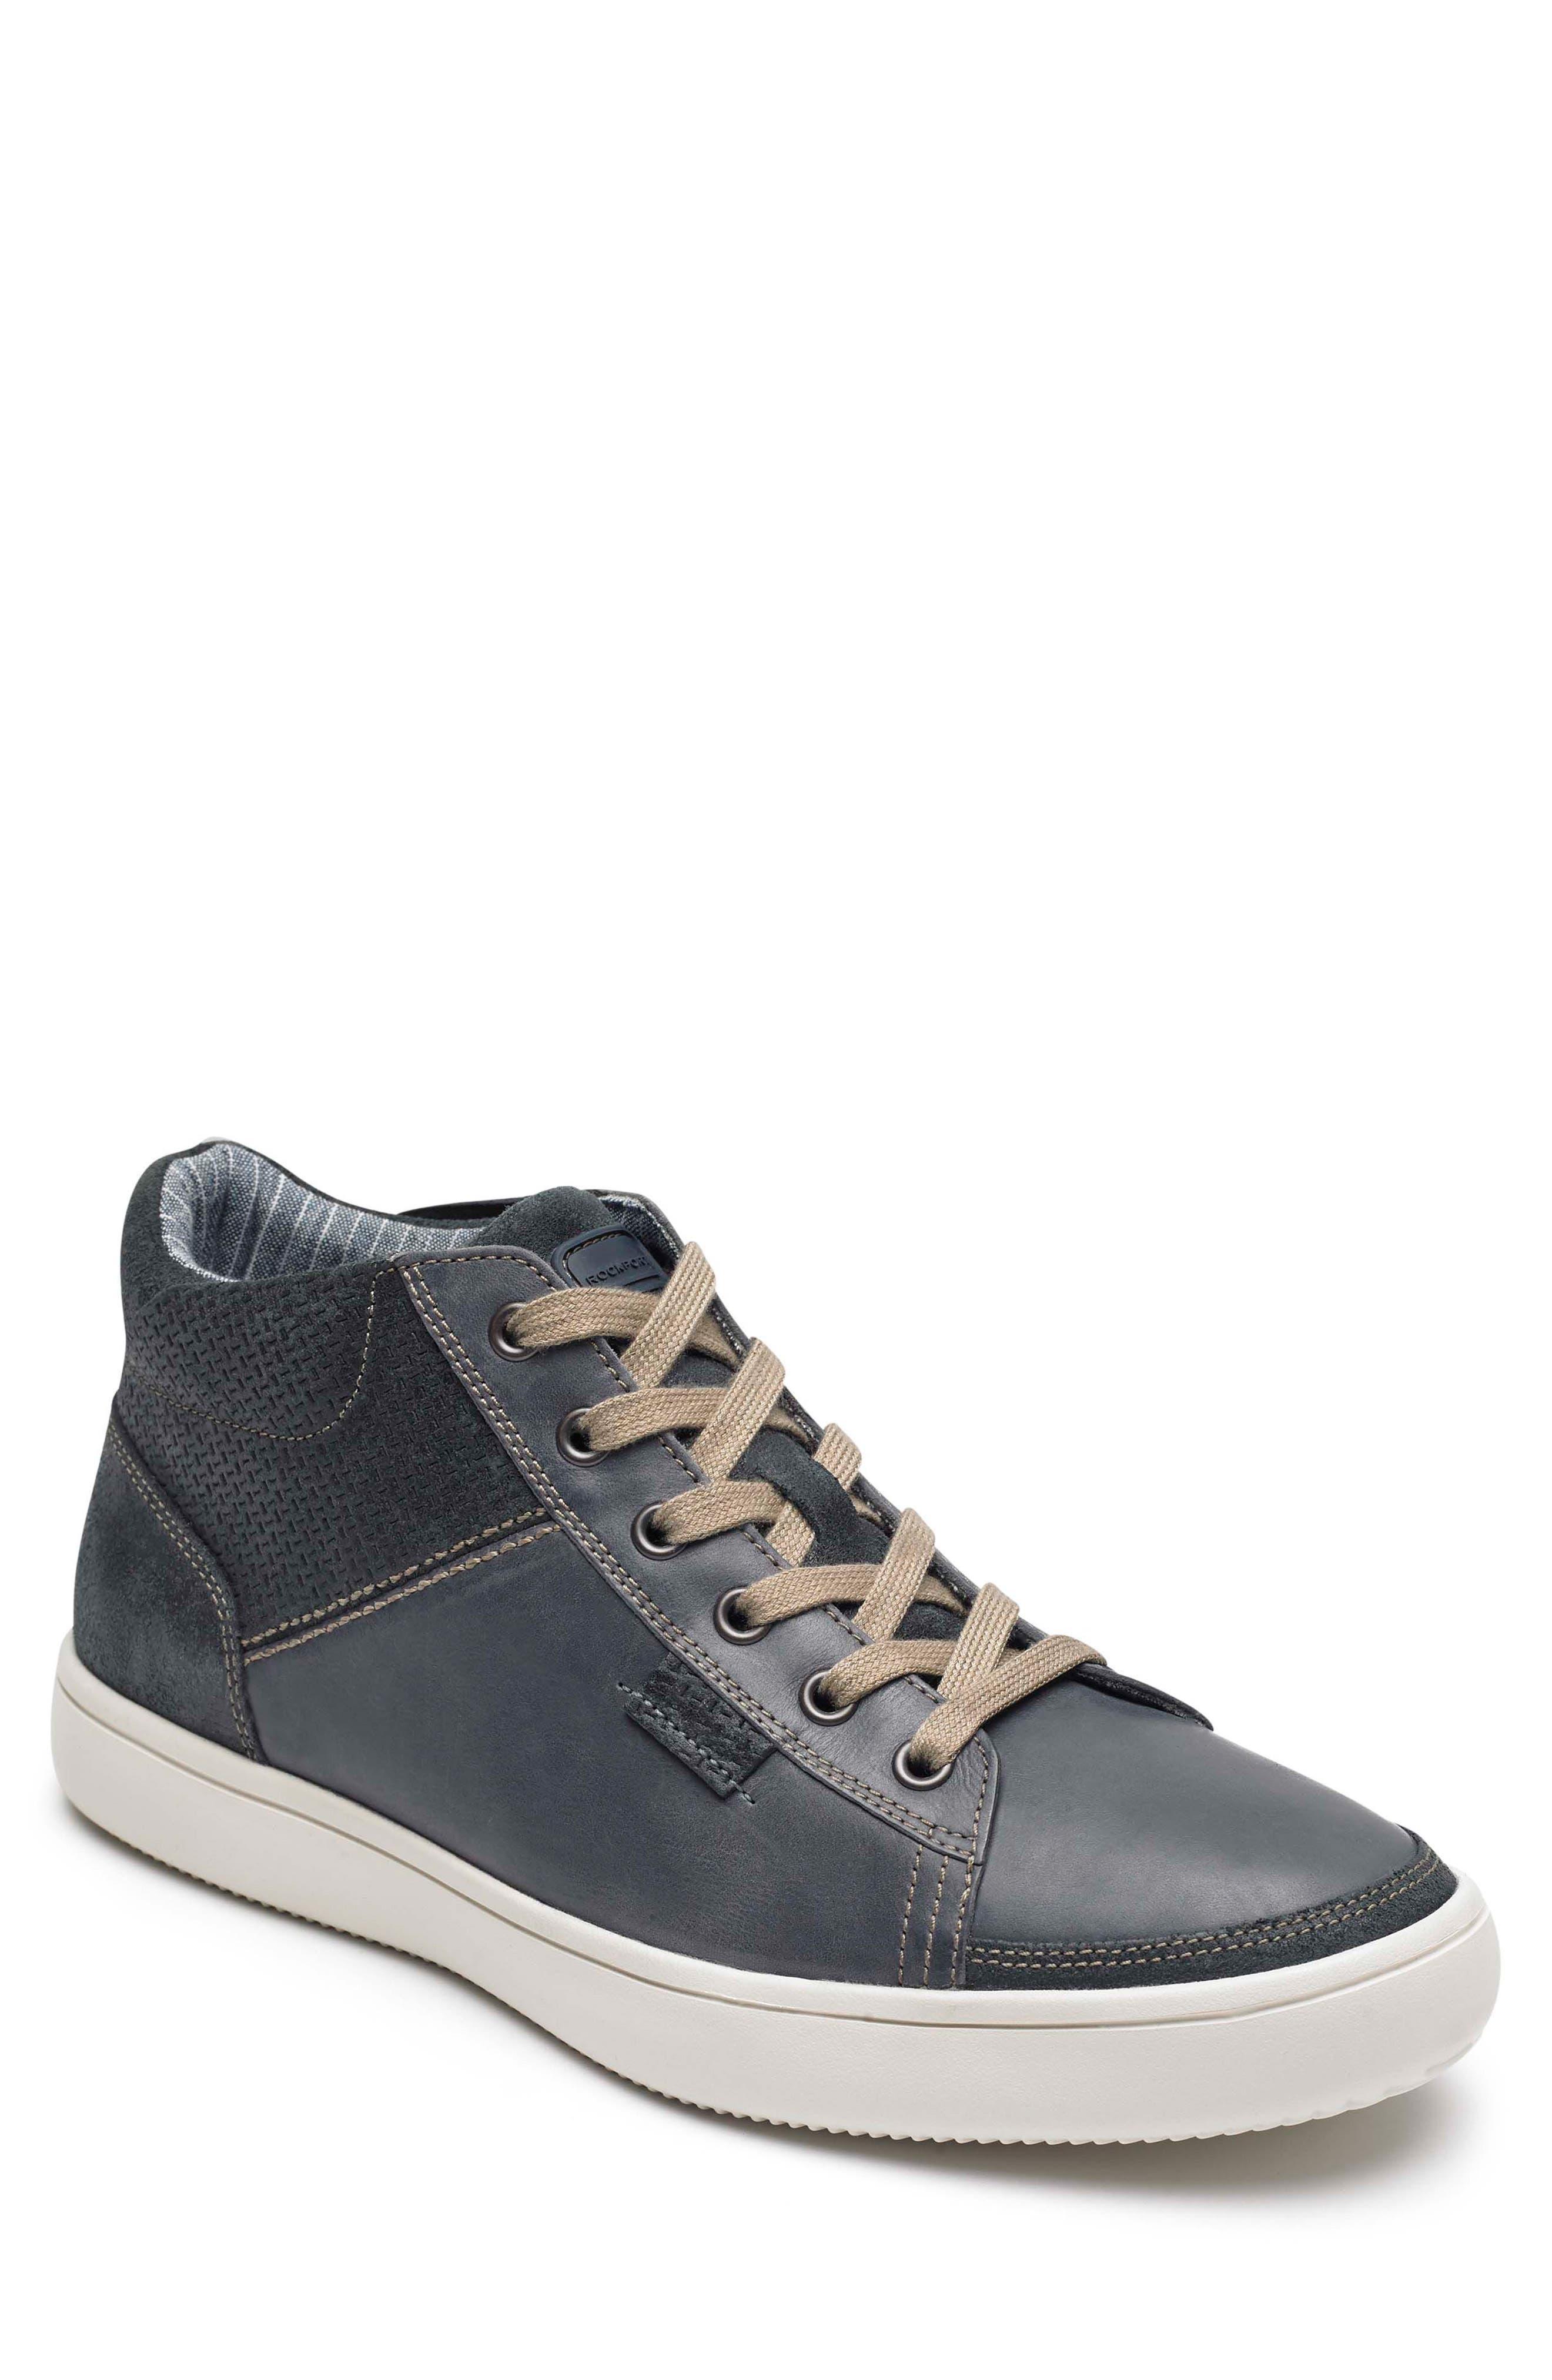 Rockport Colle Sneaker (Men)